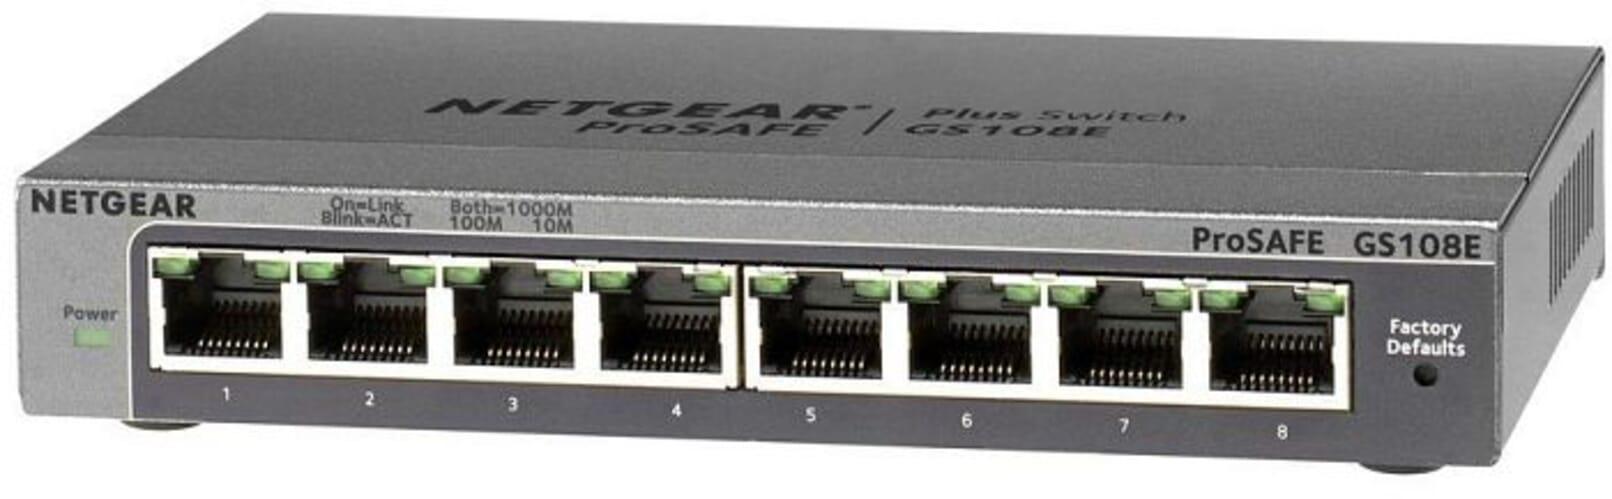 Netgear ProSAFE Plus 8-poorts Gigabit Netwerk Switch